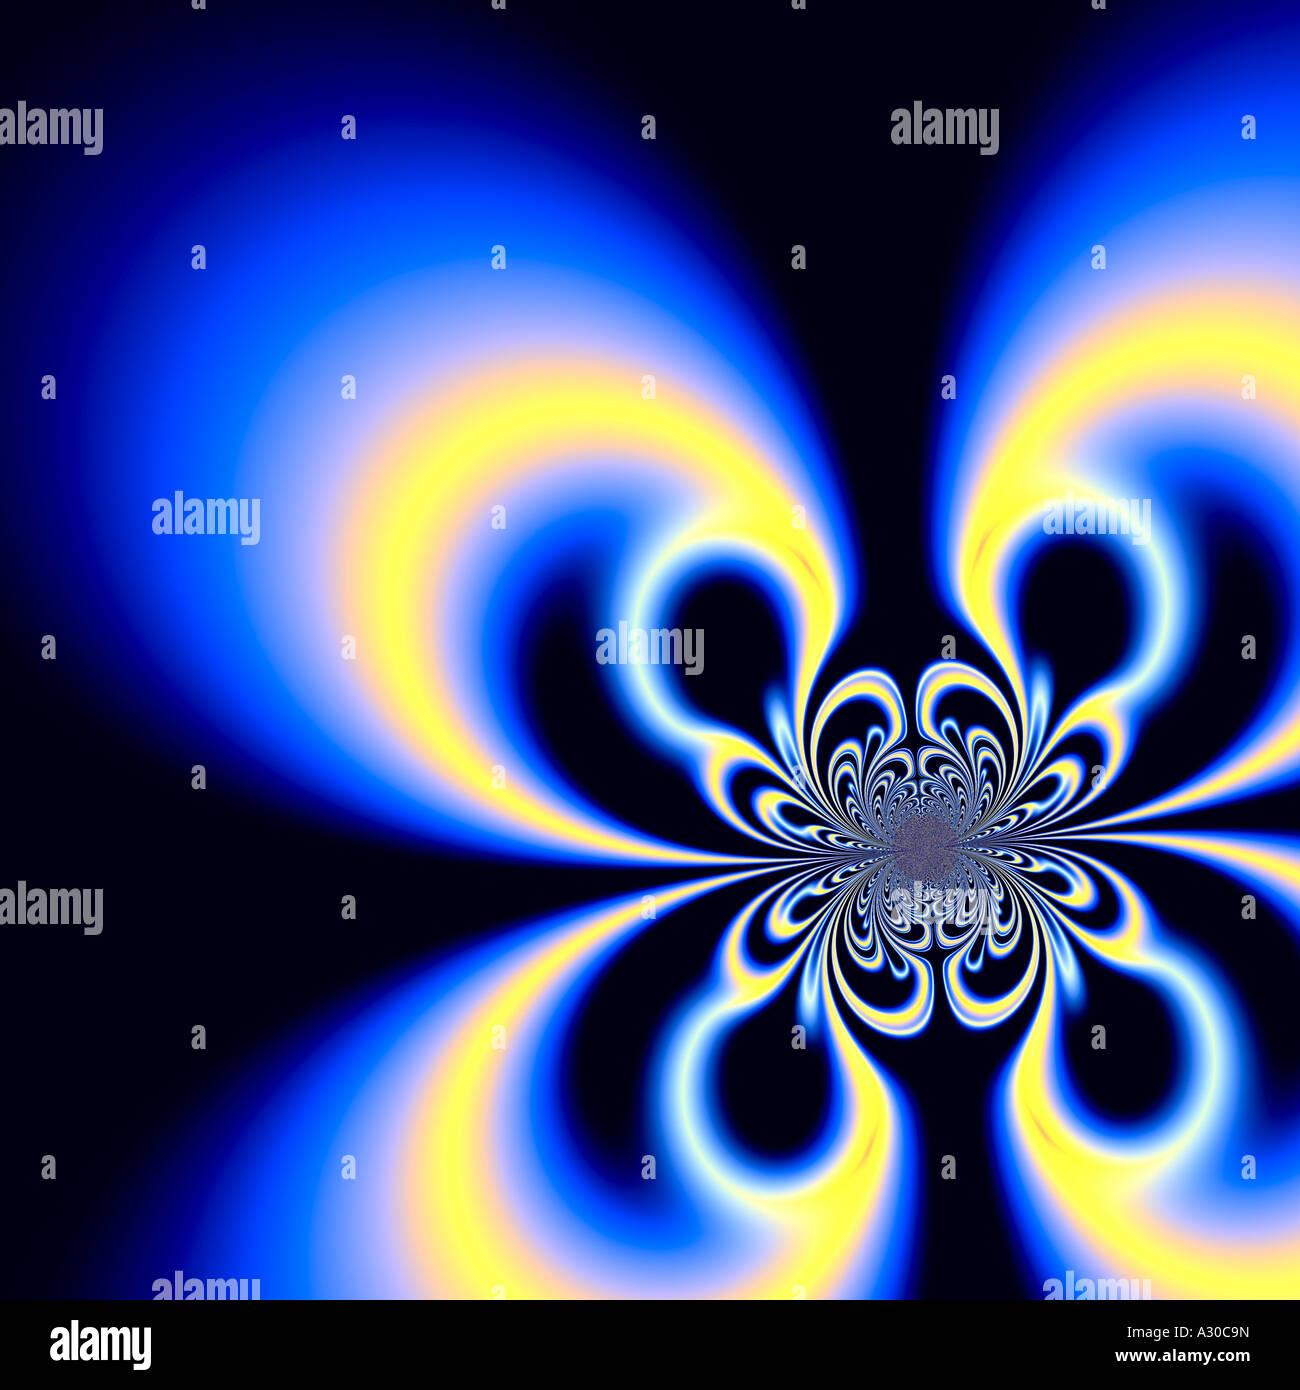 Computer generated fractal image amorphous brilliant chimera cloud diffuse fiction microcosm impulse stunning - Stock Image